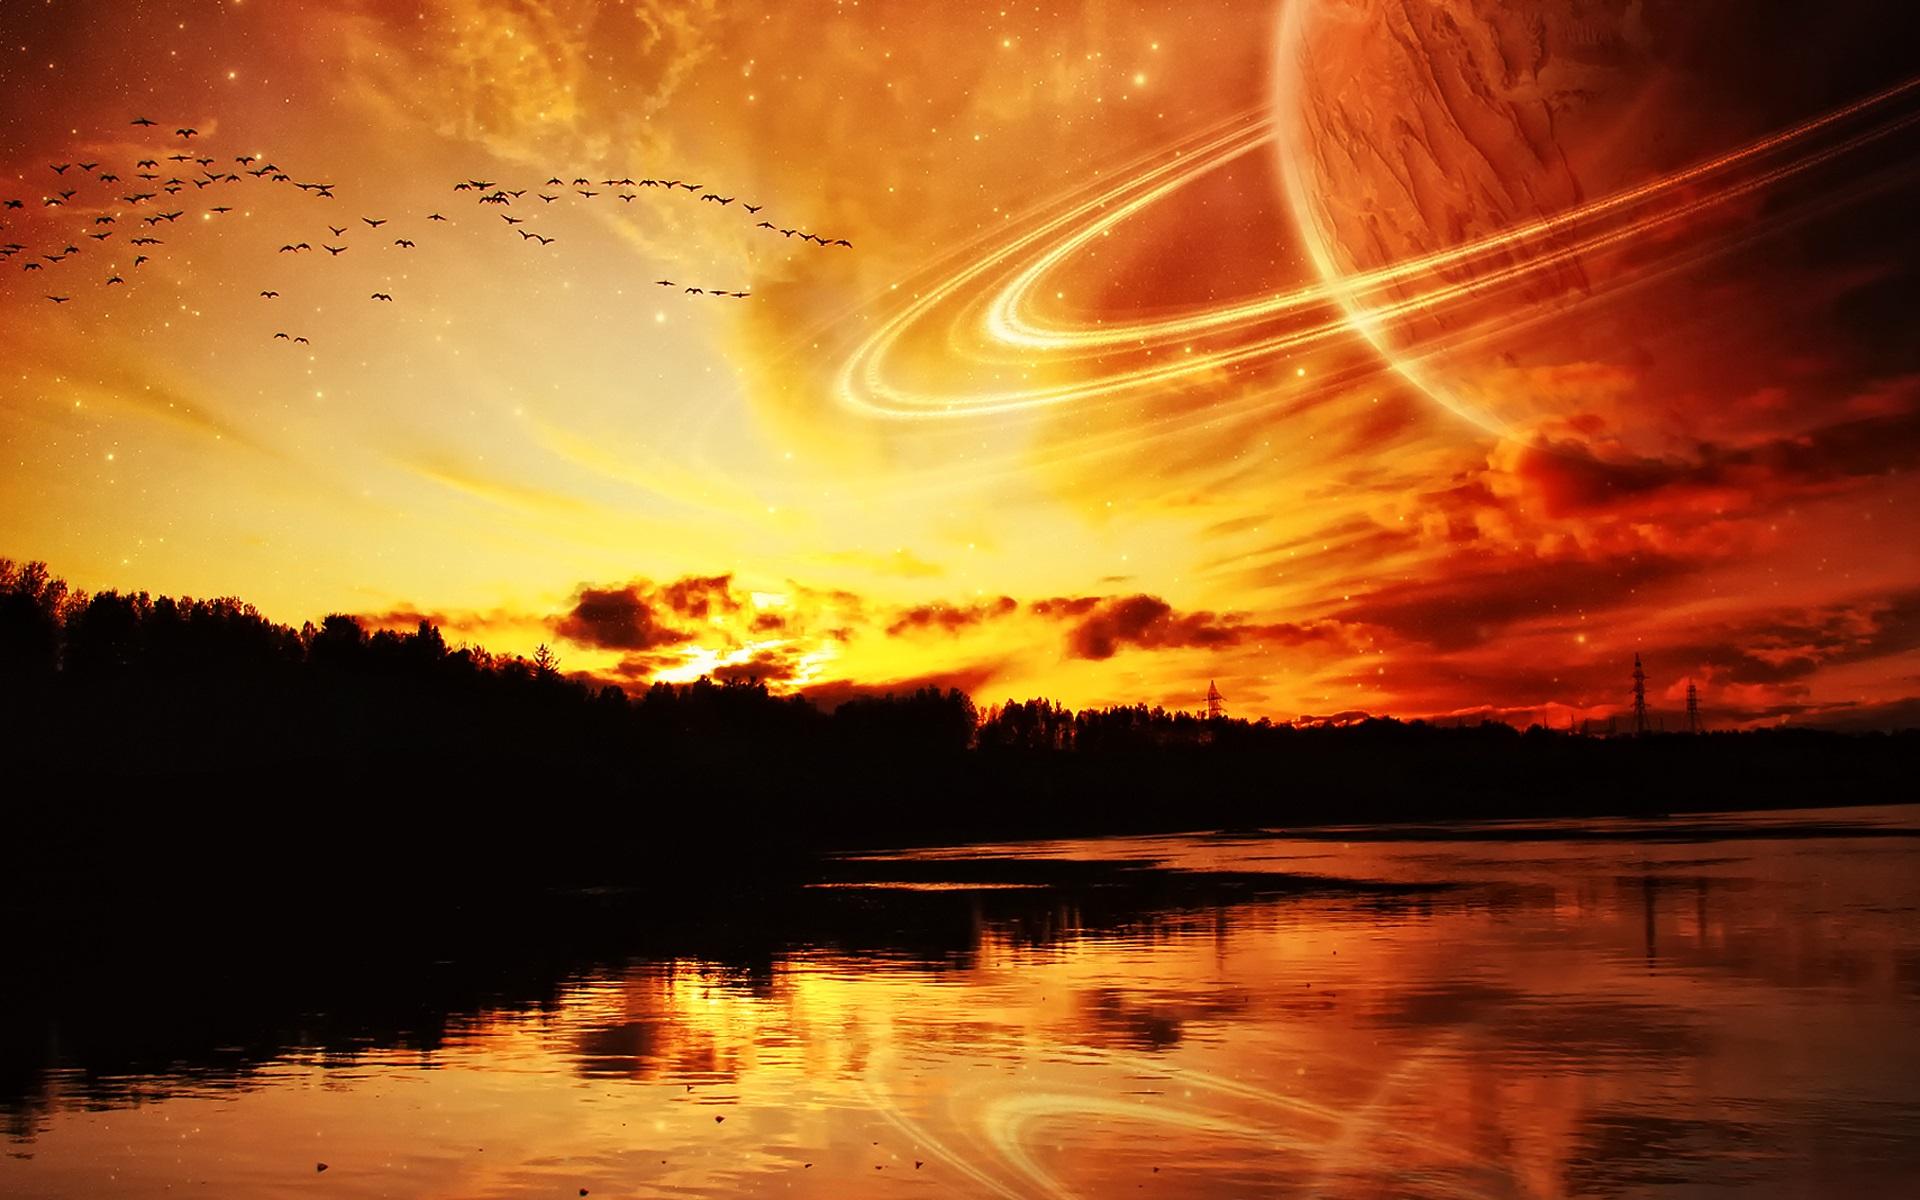 Wallpaper Dream World River Planet Space Night 1920x1200 HD